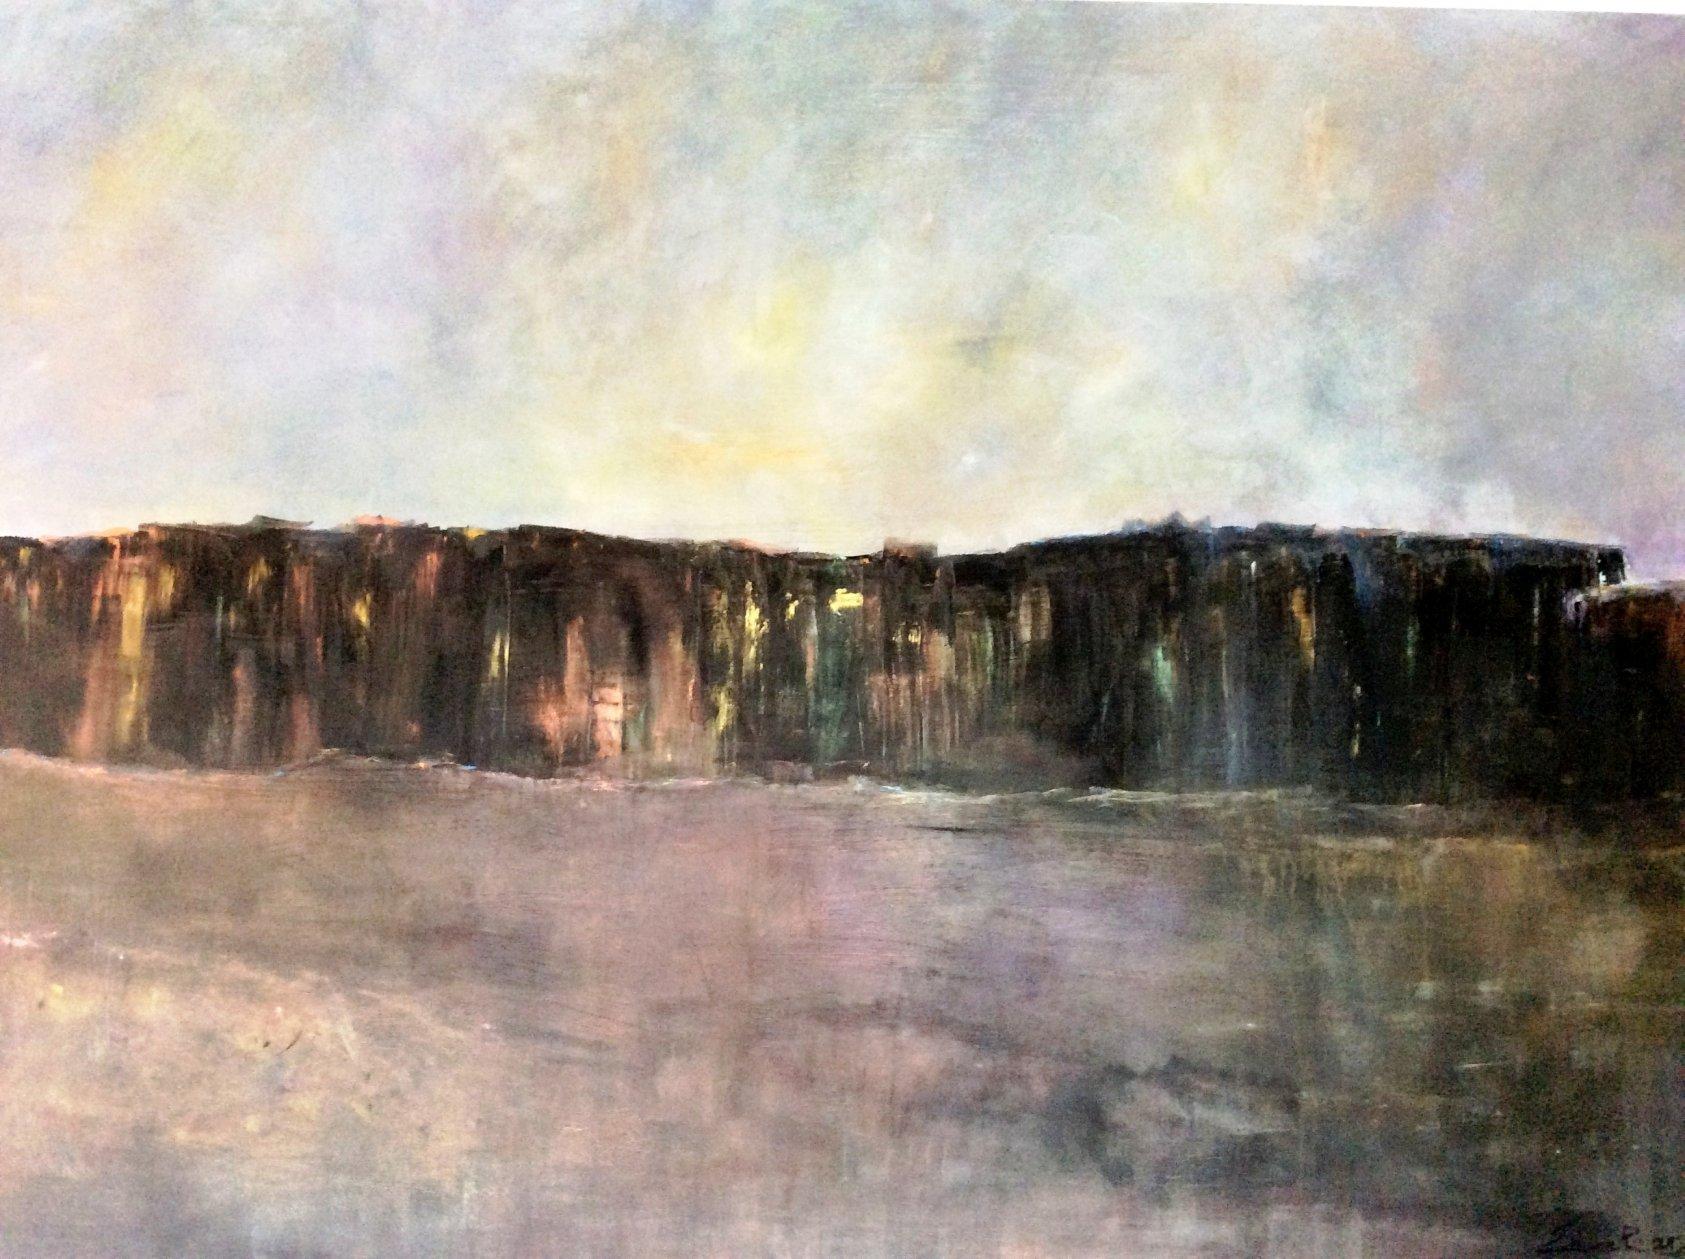 Ashes of a soul (2016) - Eduarda Costa Ferraz